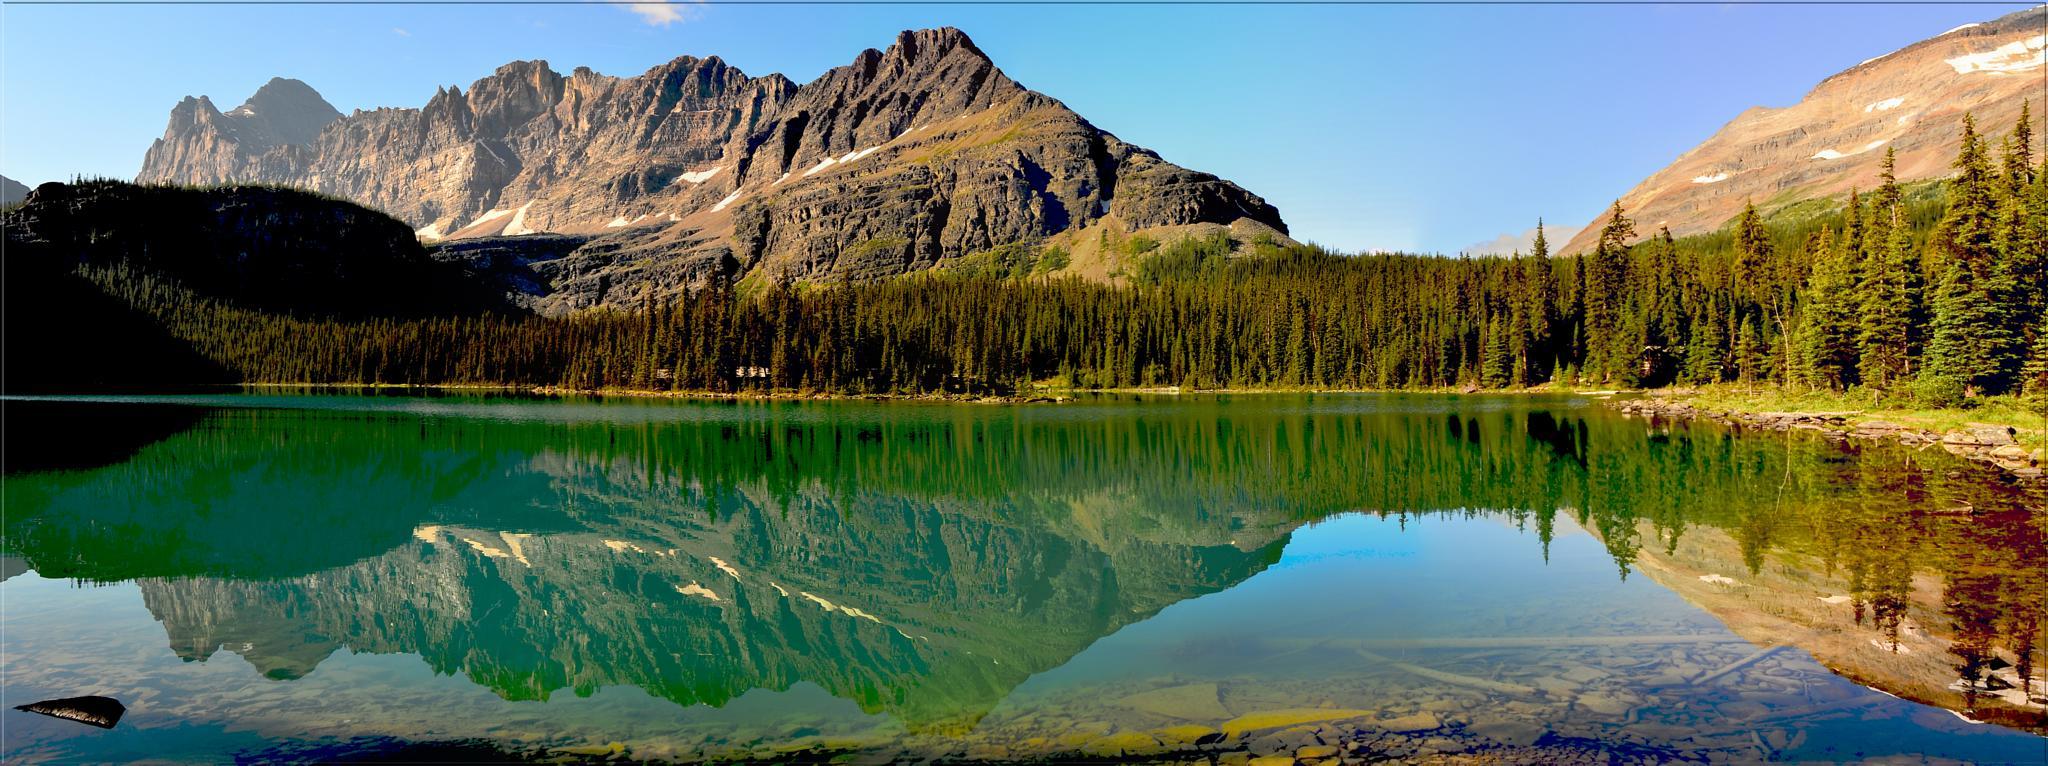 Lake O'Hara, Yoho National Park, British Columbia, Canada by Merle Layden